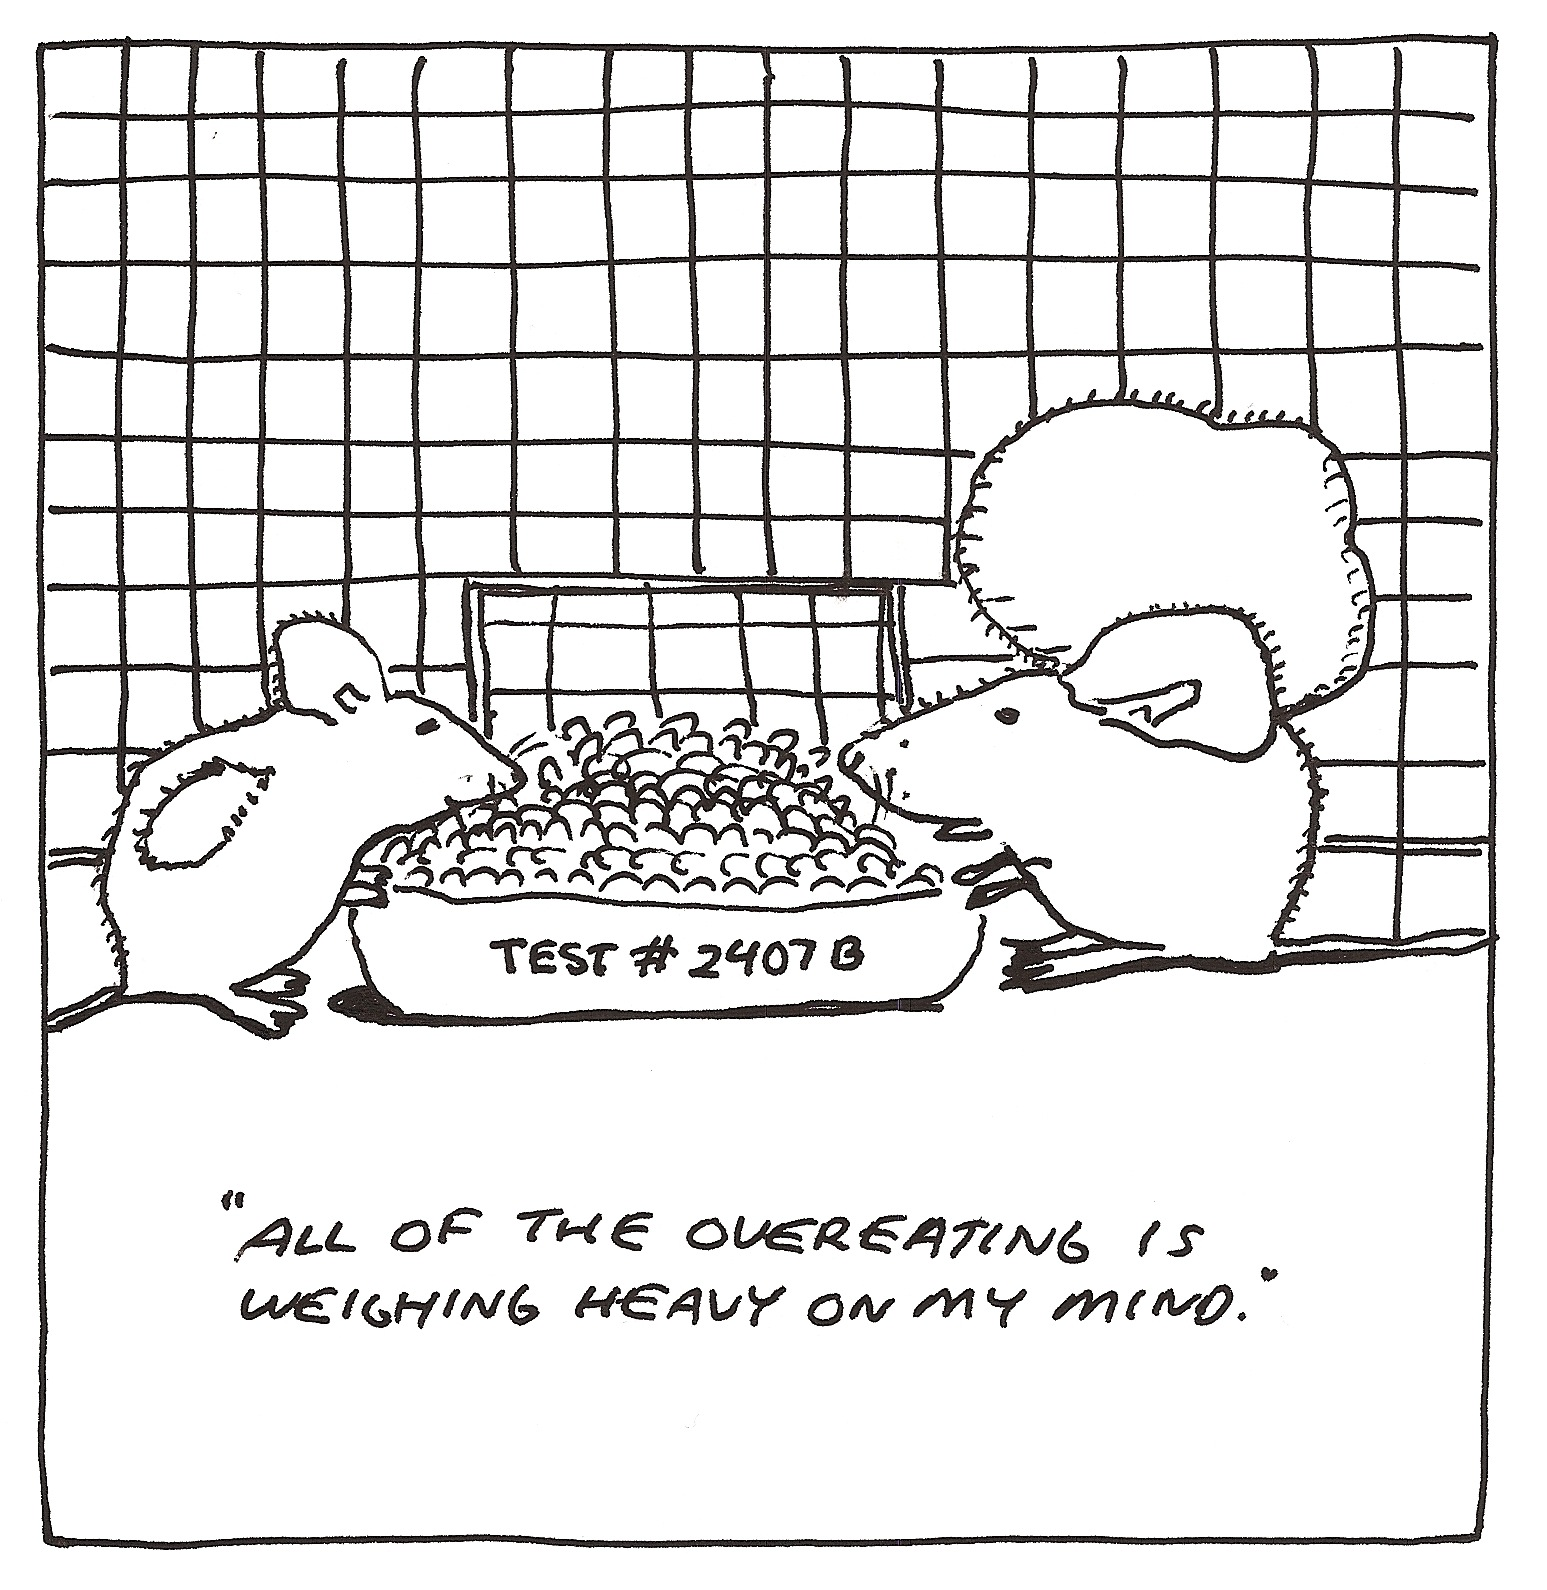 berry cartoons: berry cartoon animal testing